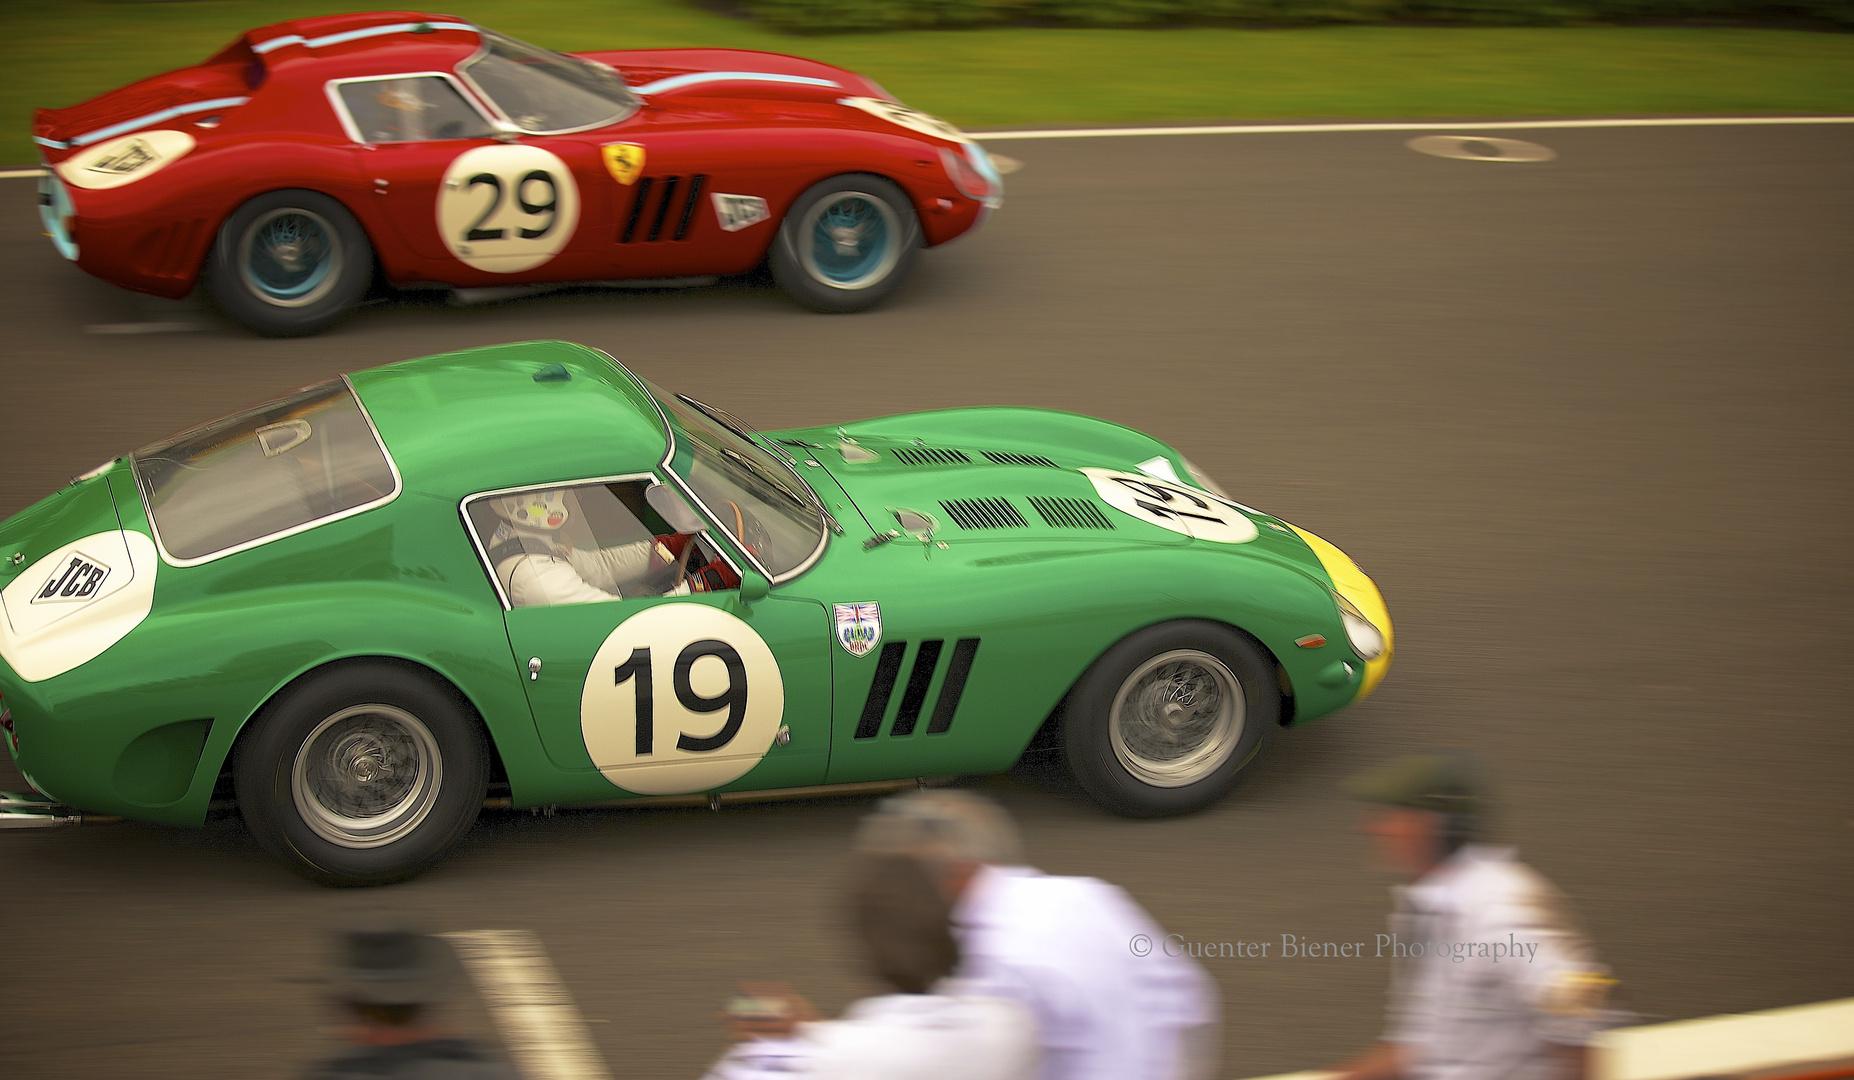 TT Celebration Race, Ferrari 250 GTO (Nr. 19)....